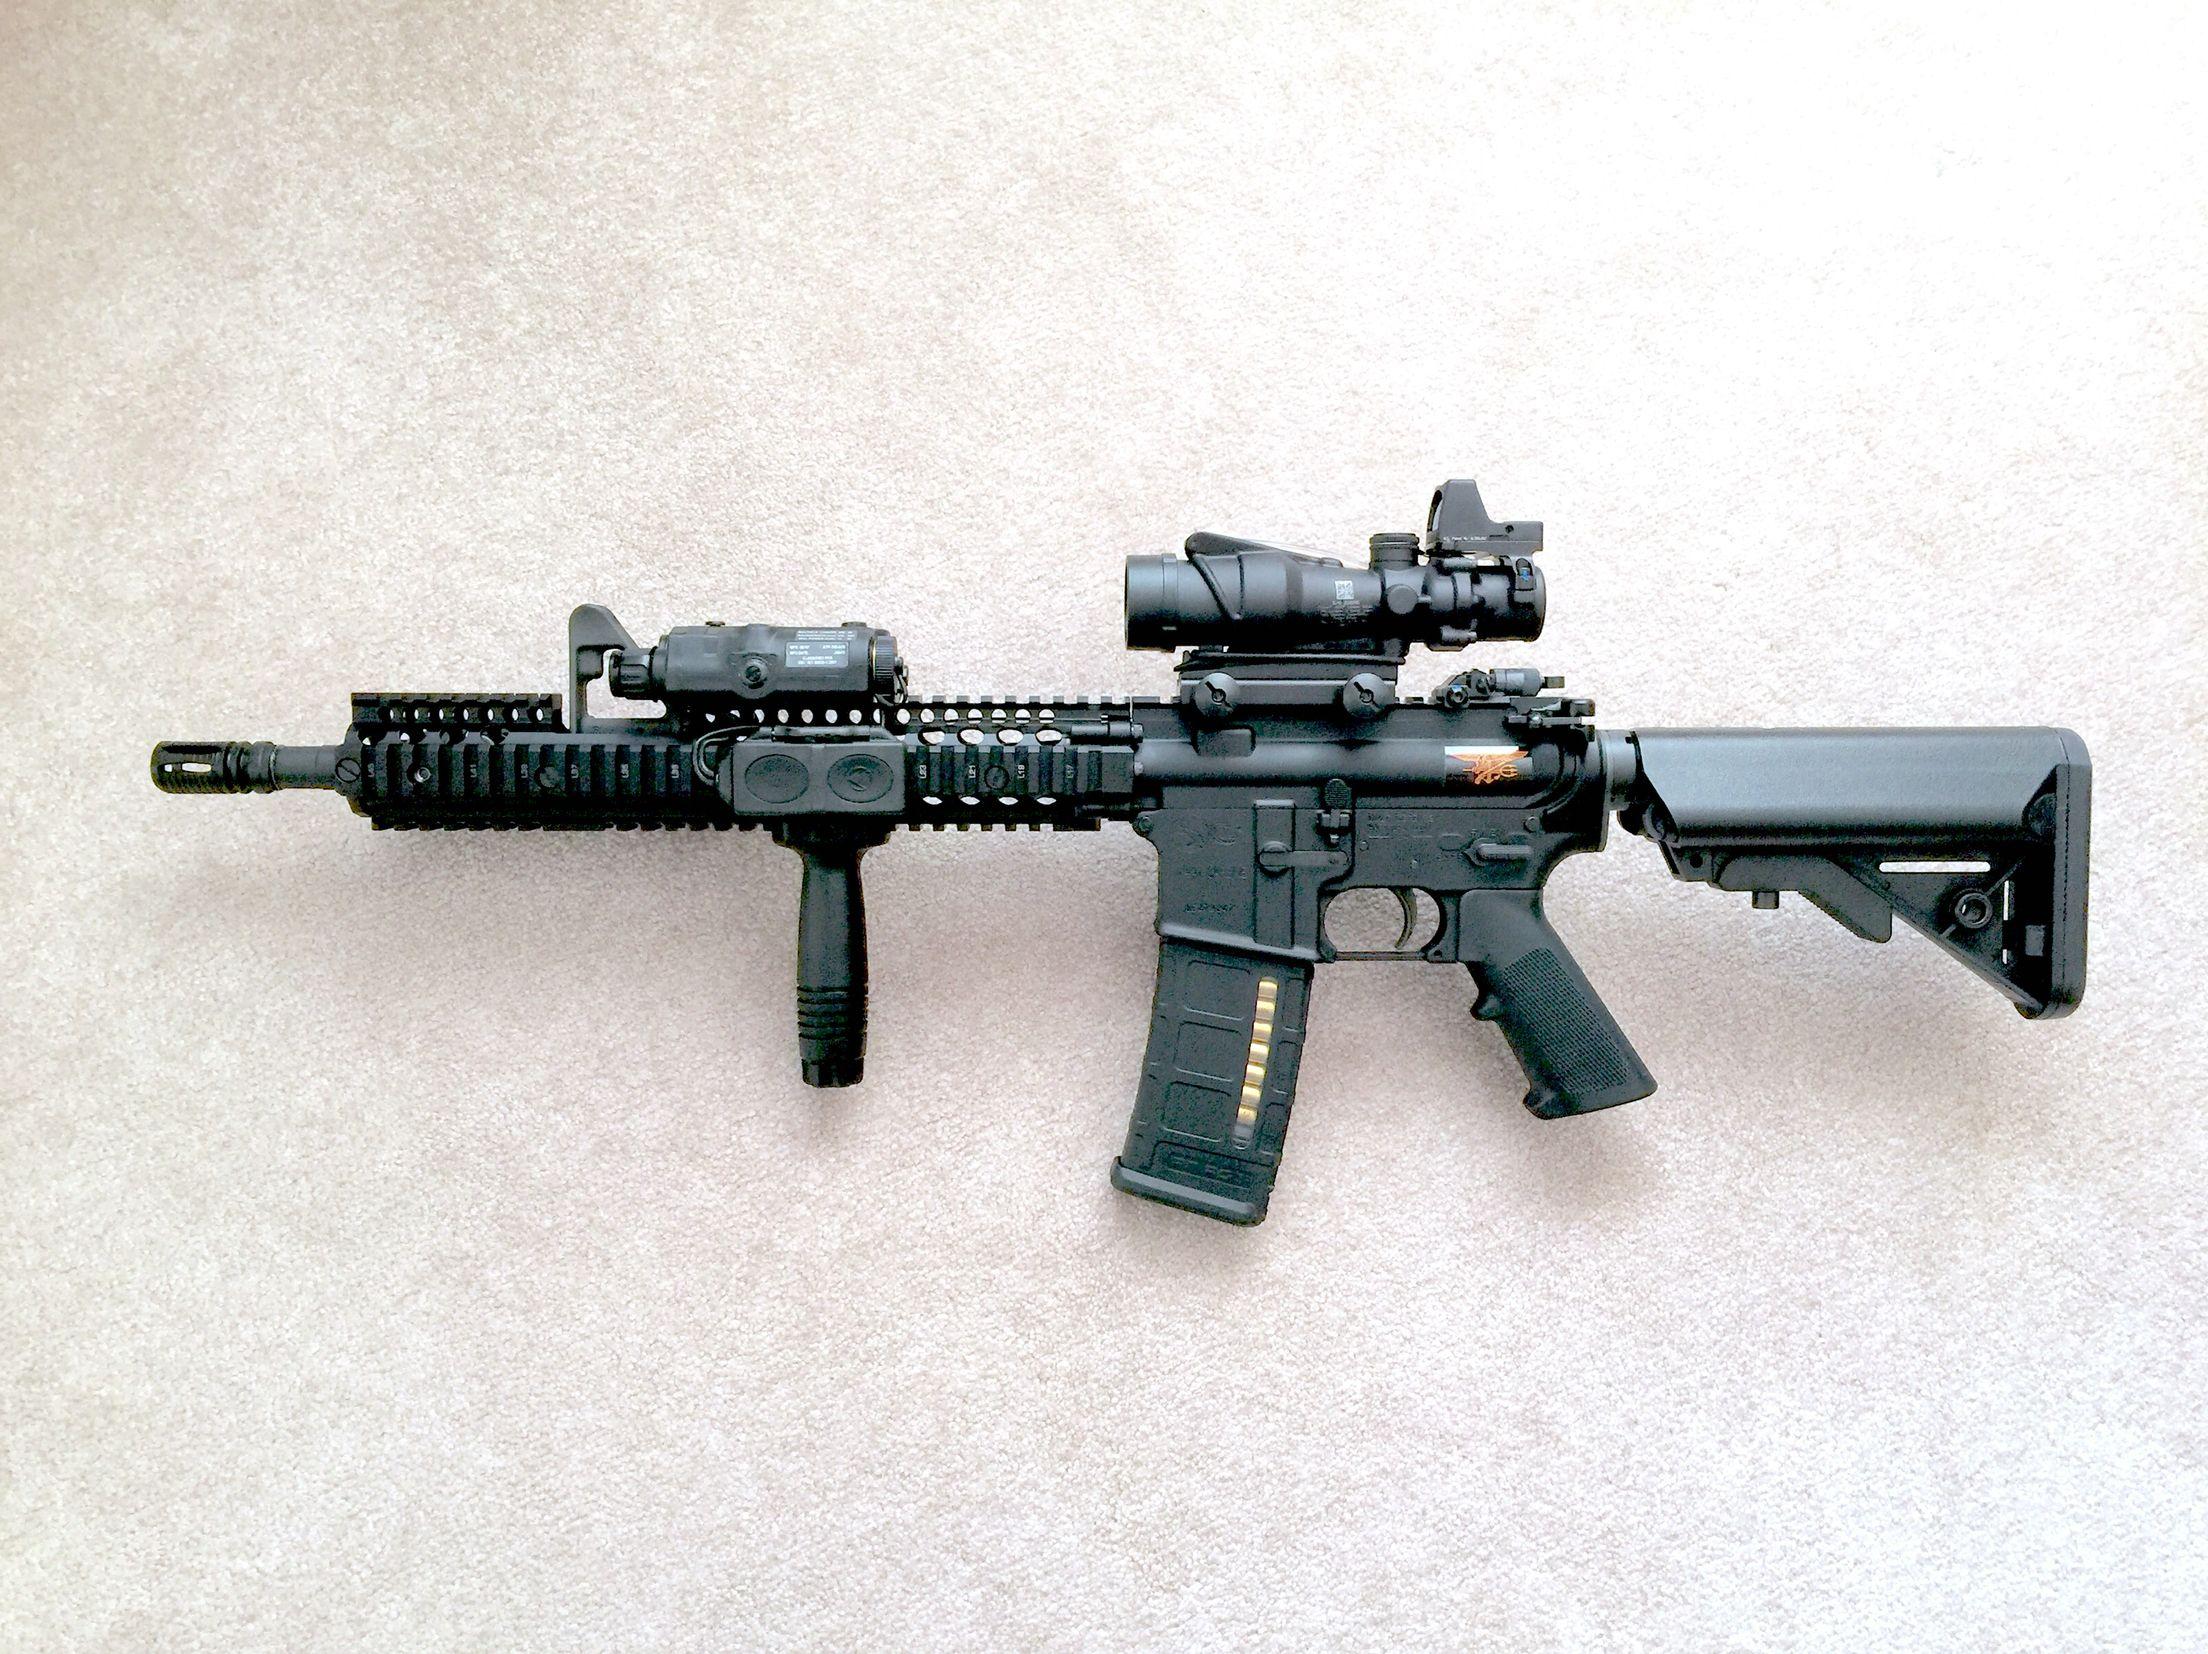 M4A1 Carbine (SOOMOD Block II): Colt M4A1 Lower & Upper Receiver